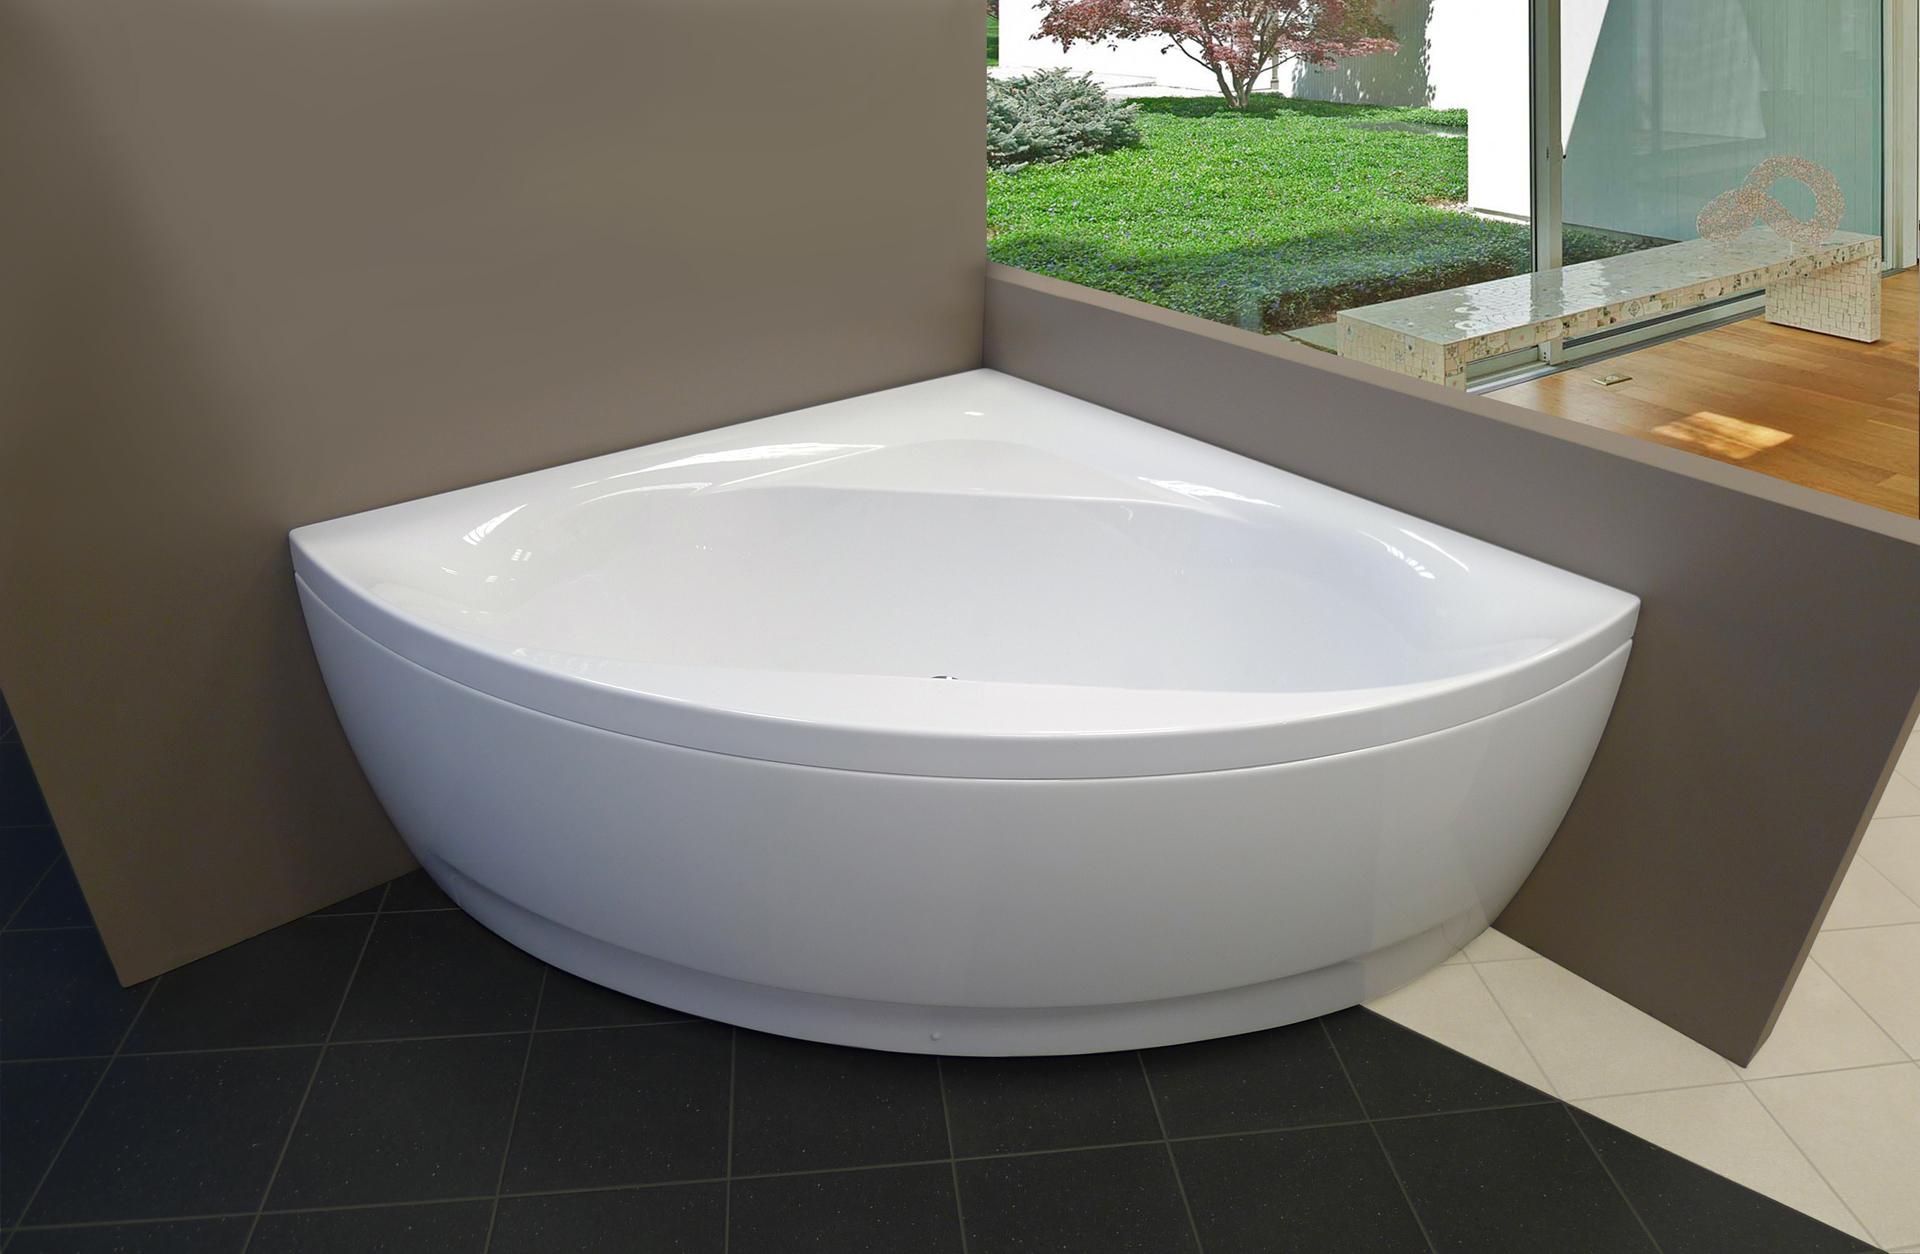 Aquatica OliviaWht Acrylic Corner Bathtub